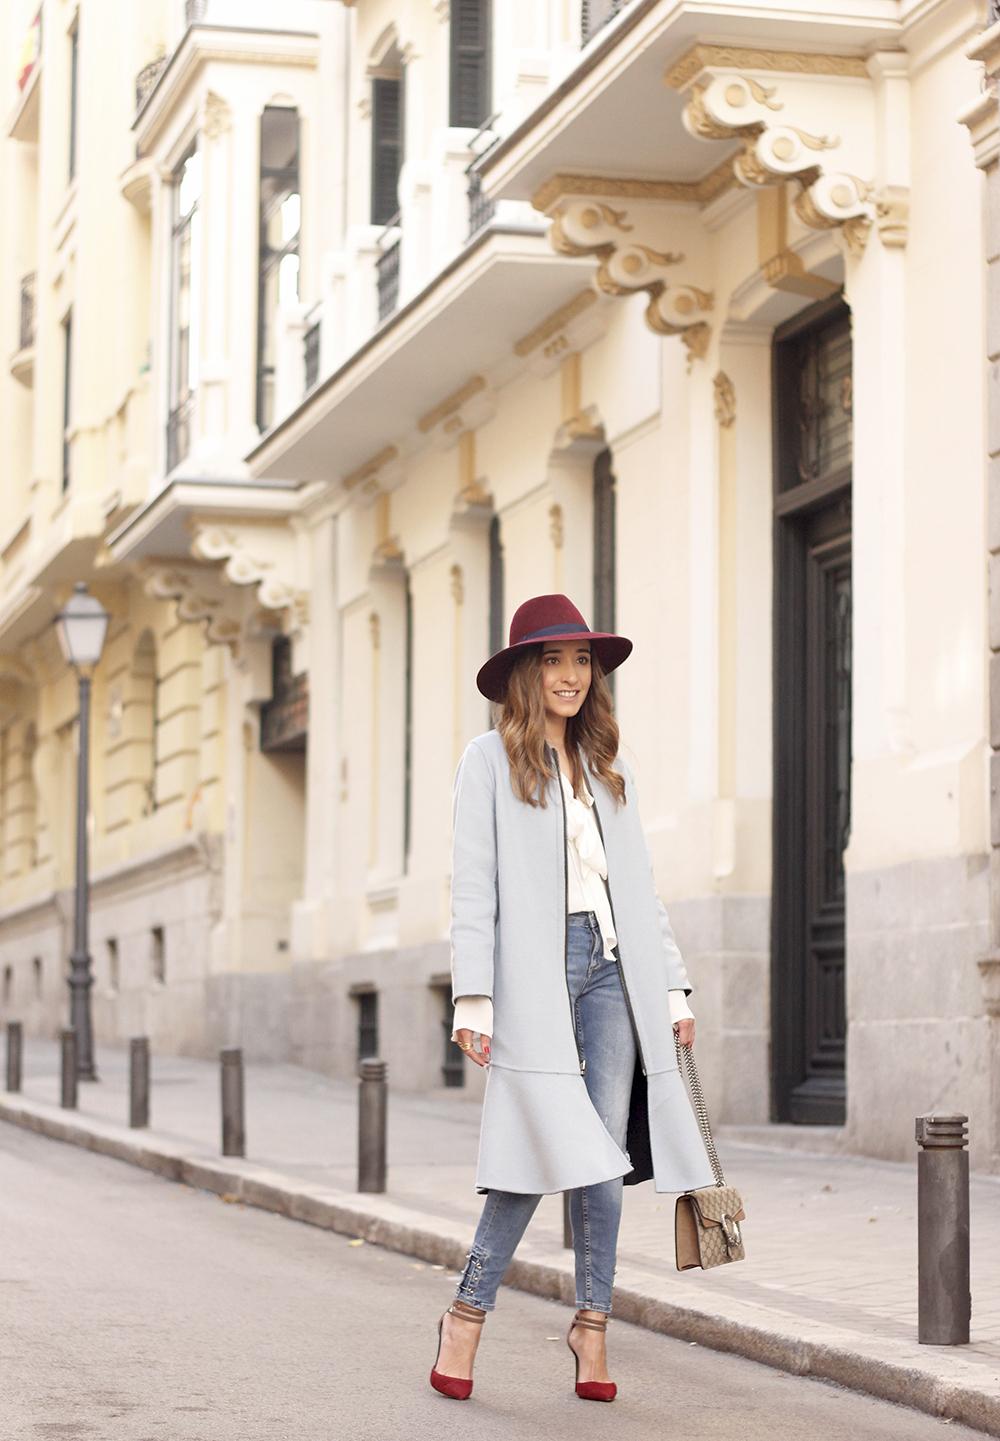 blue coat uterqüe abrigo azul gucci bag burgundy heels winter outfit street style fashion11